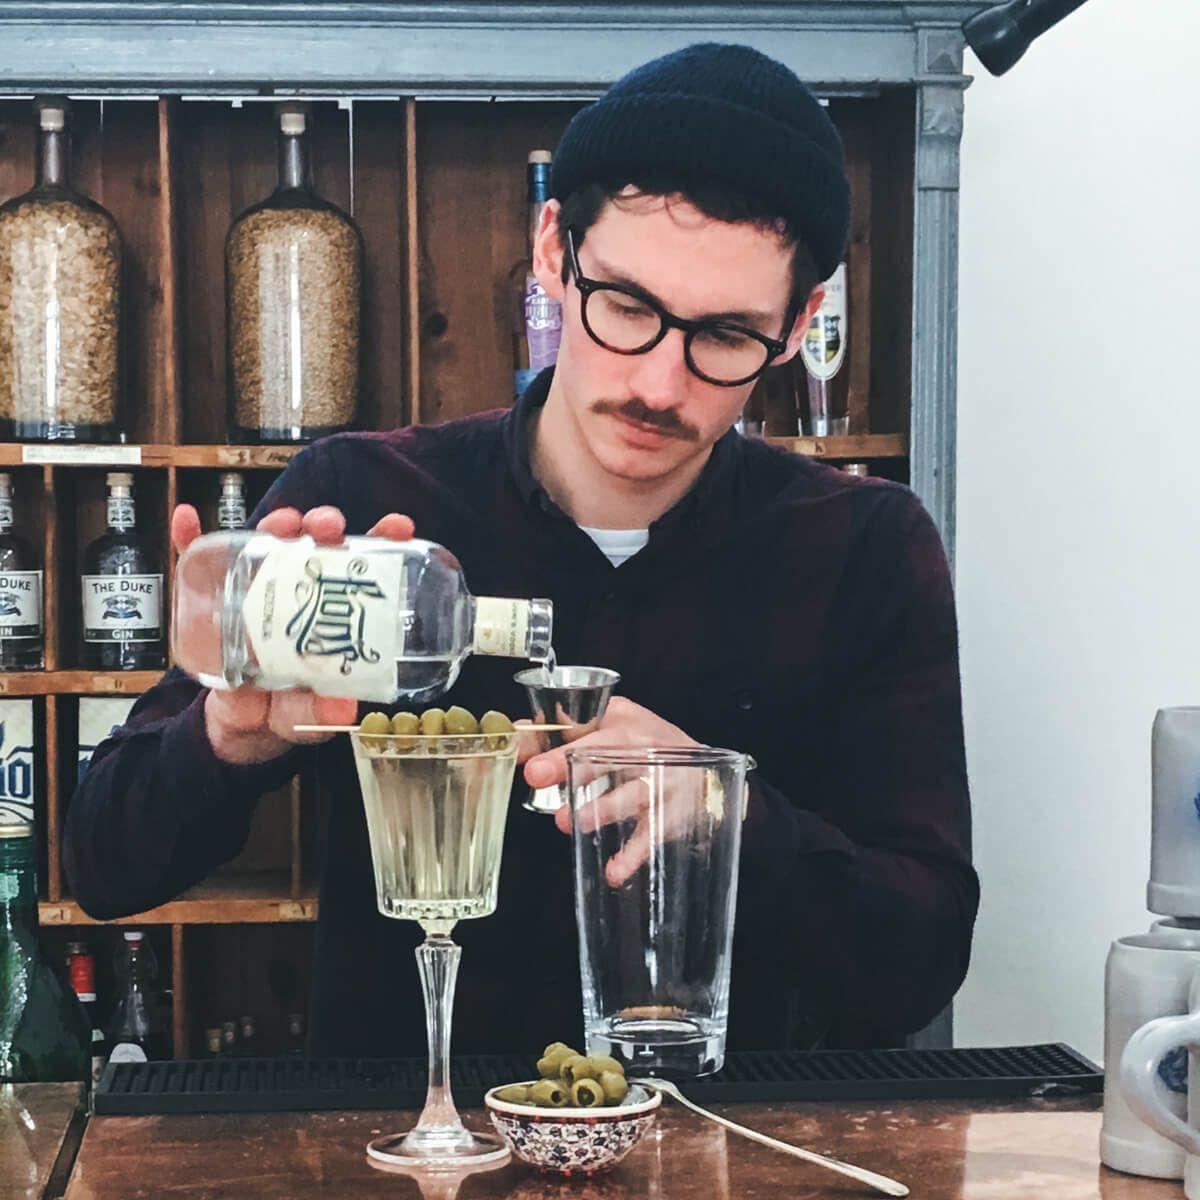 LION's Vodka Dirty Martini